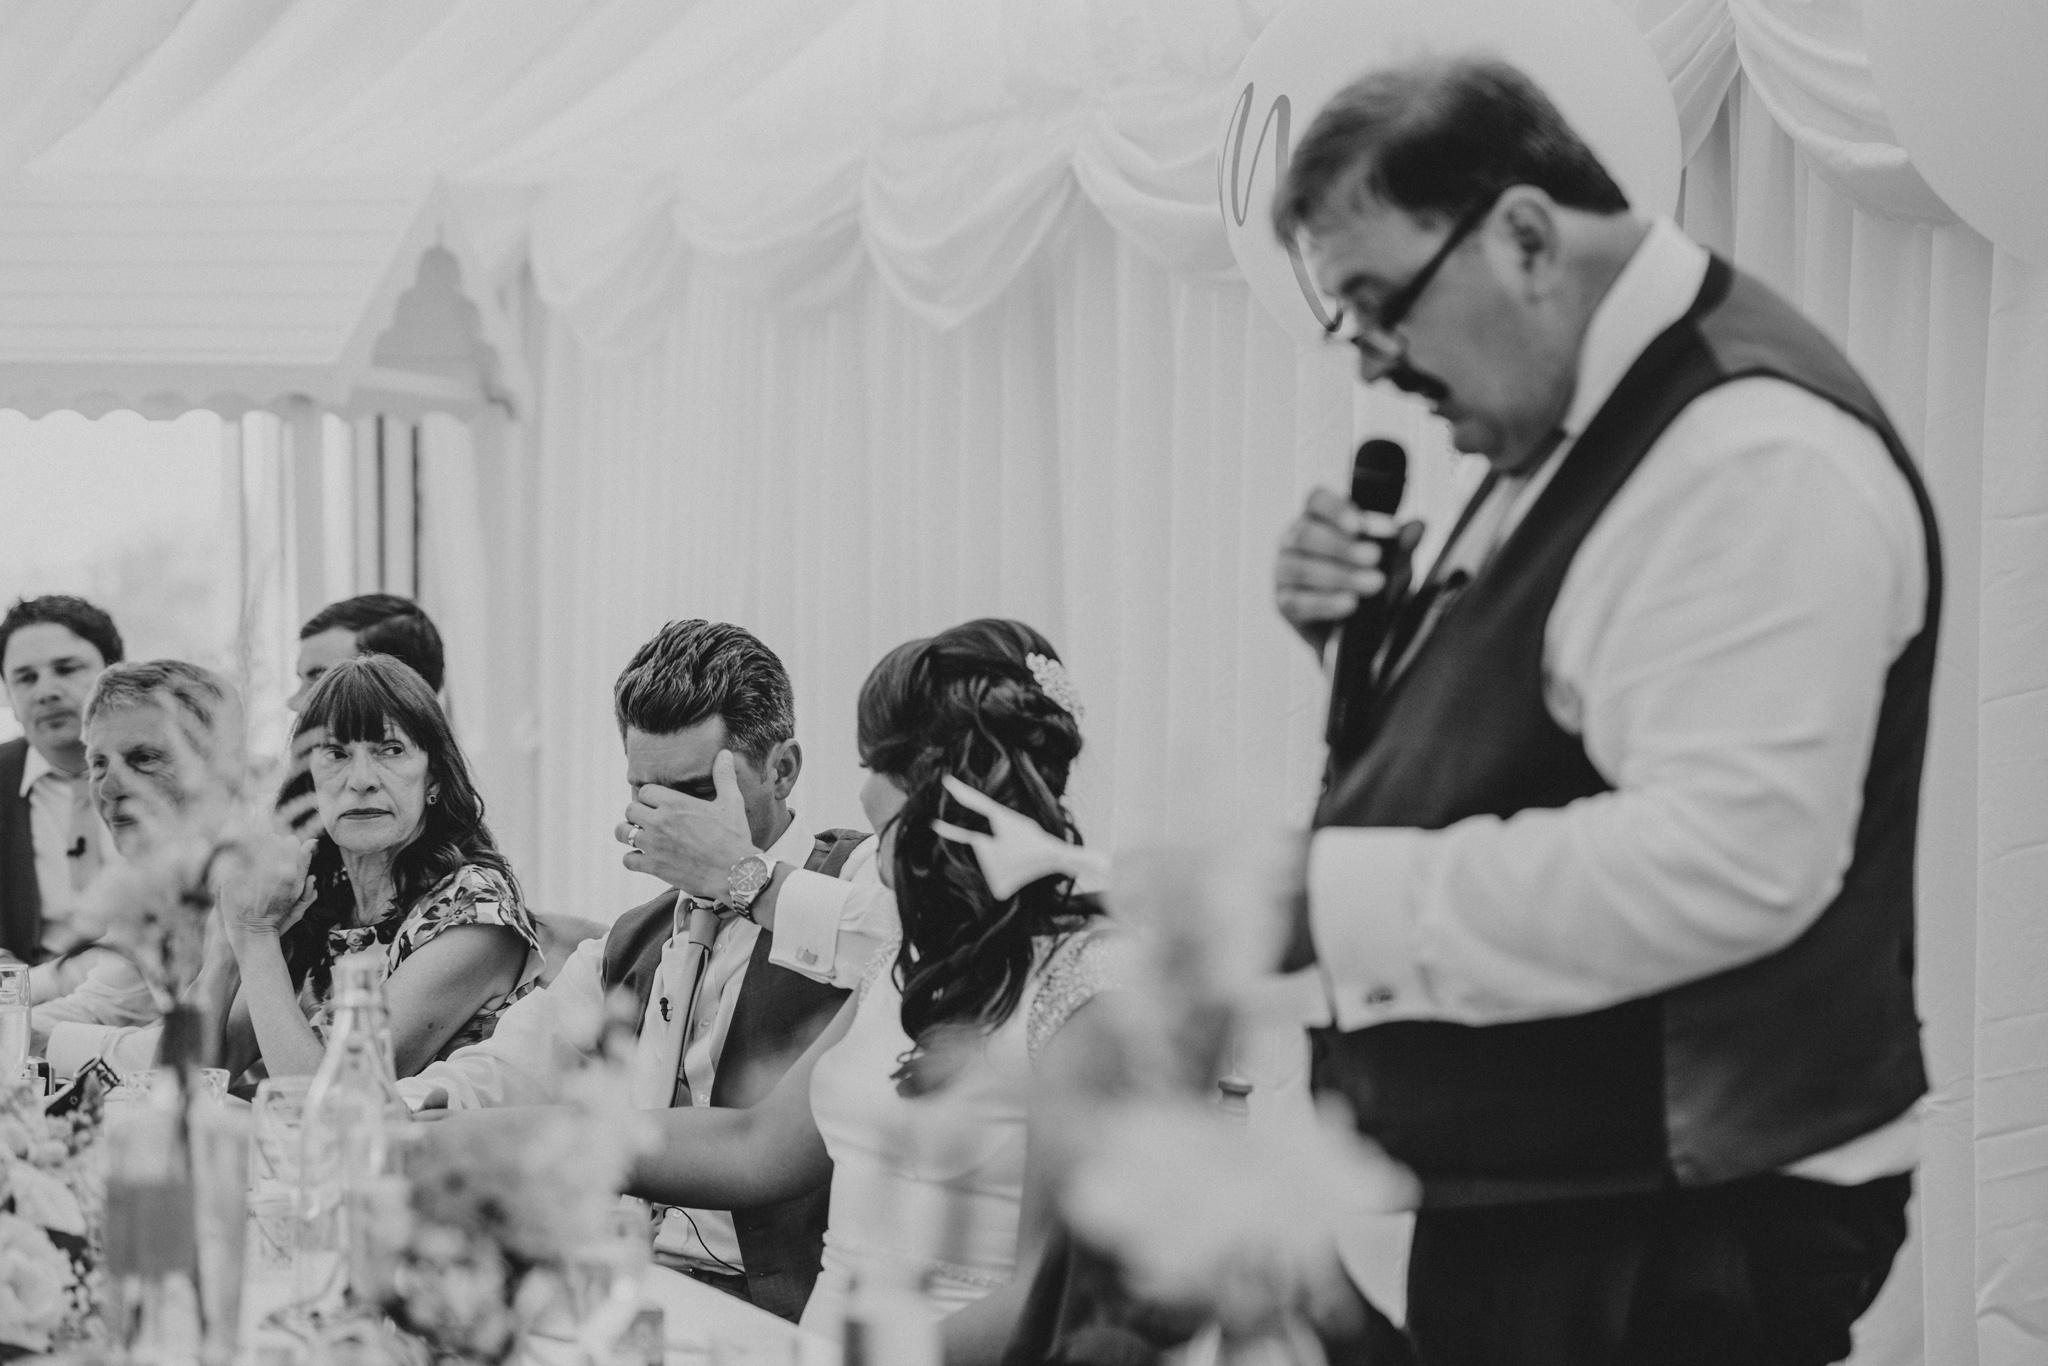 danielle-and-gareths-boho-wedding-previews-at-high-house-weddings-grace-elizabeth-colchester-essex-suffolk-norfolk-devon-alternative-wedding-and-lifestyle-photographer (58 of 76).jpg